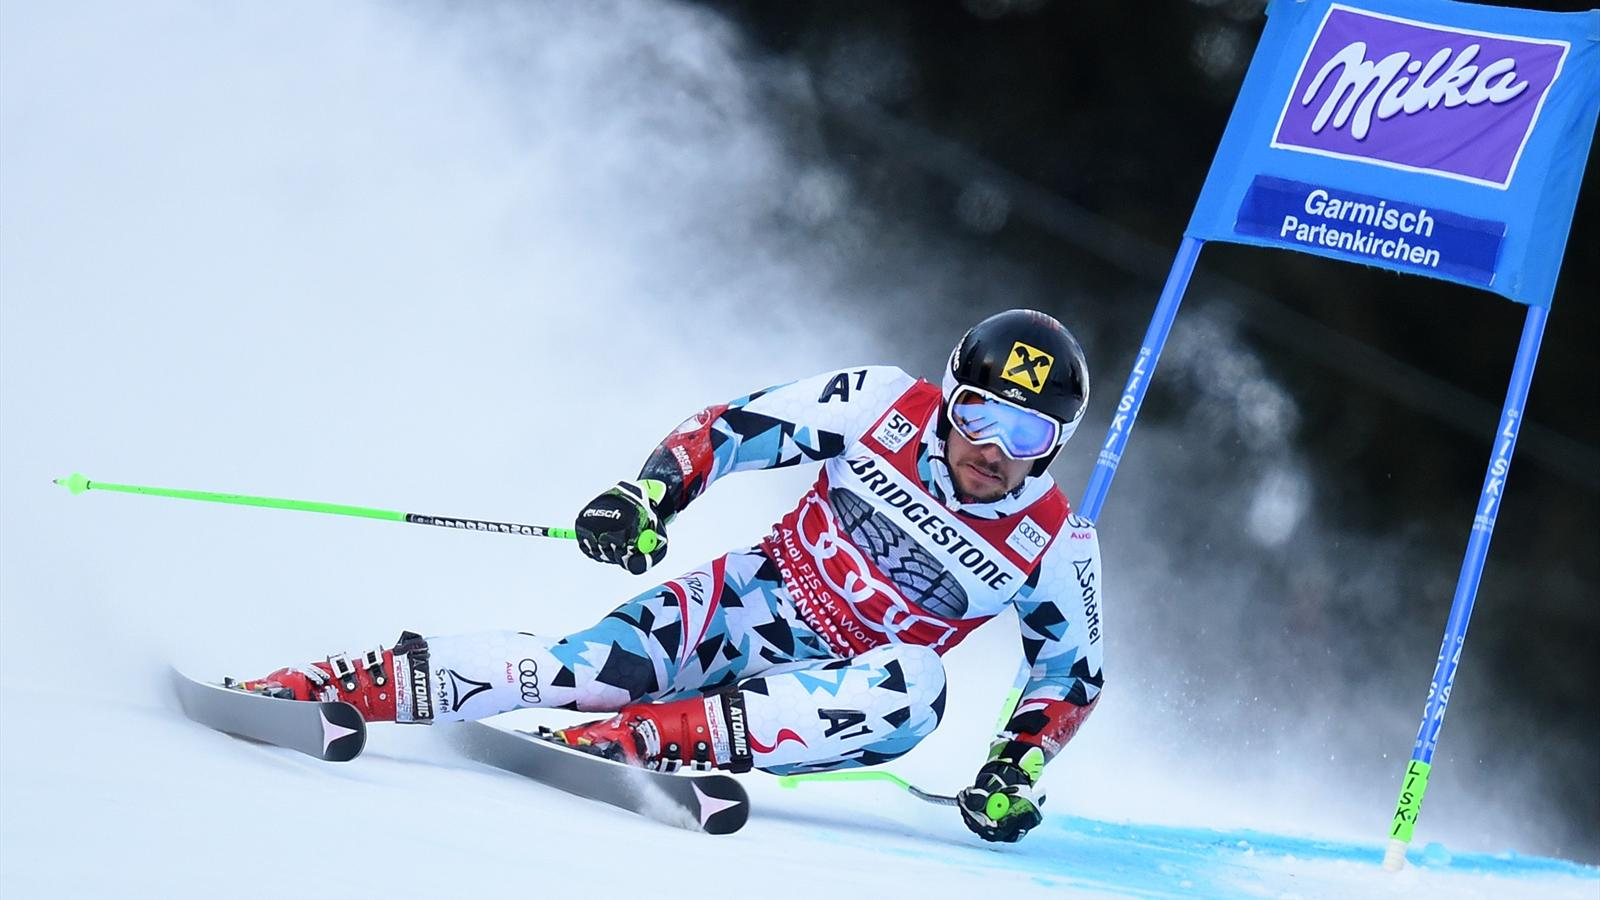 LIVE Alpine World Ski Championships - Alpine Skiing - Eurosport